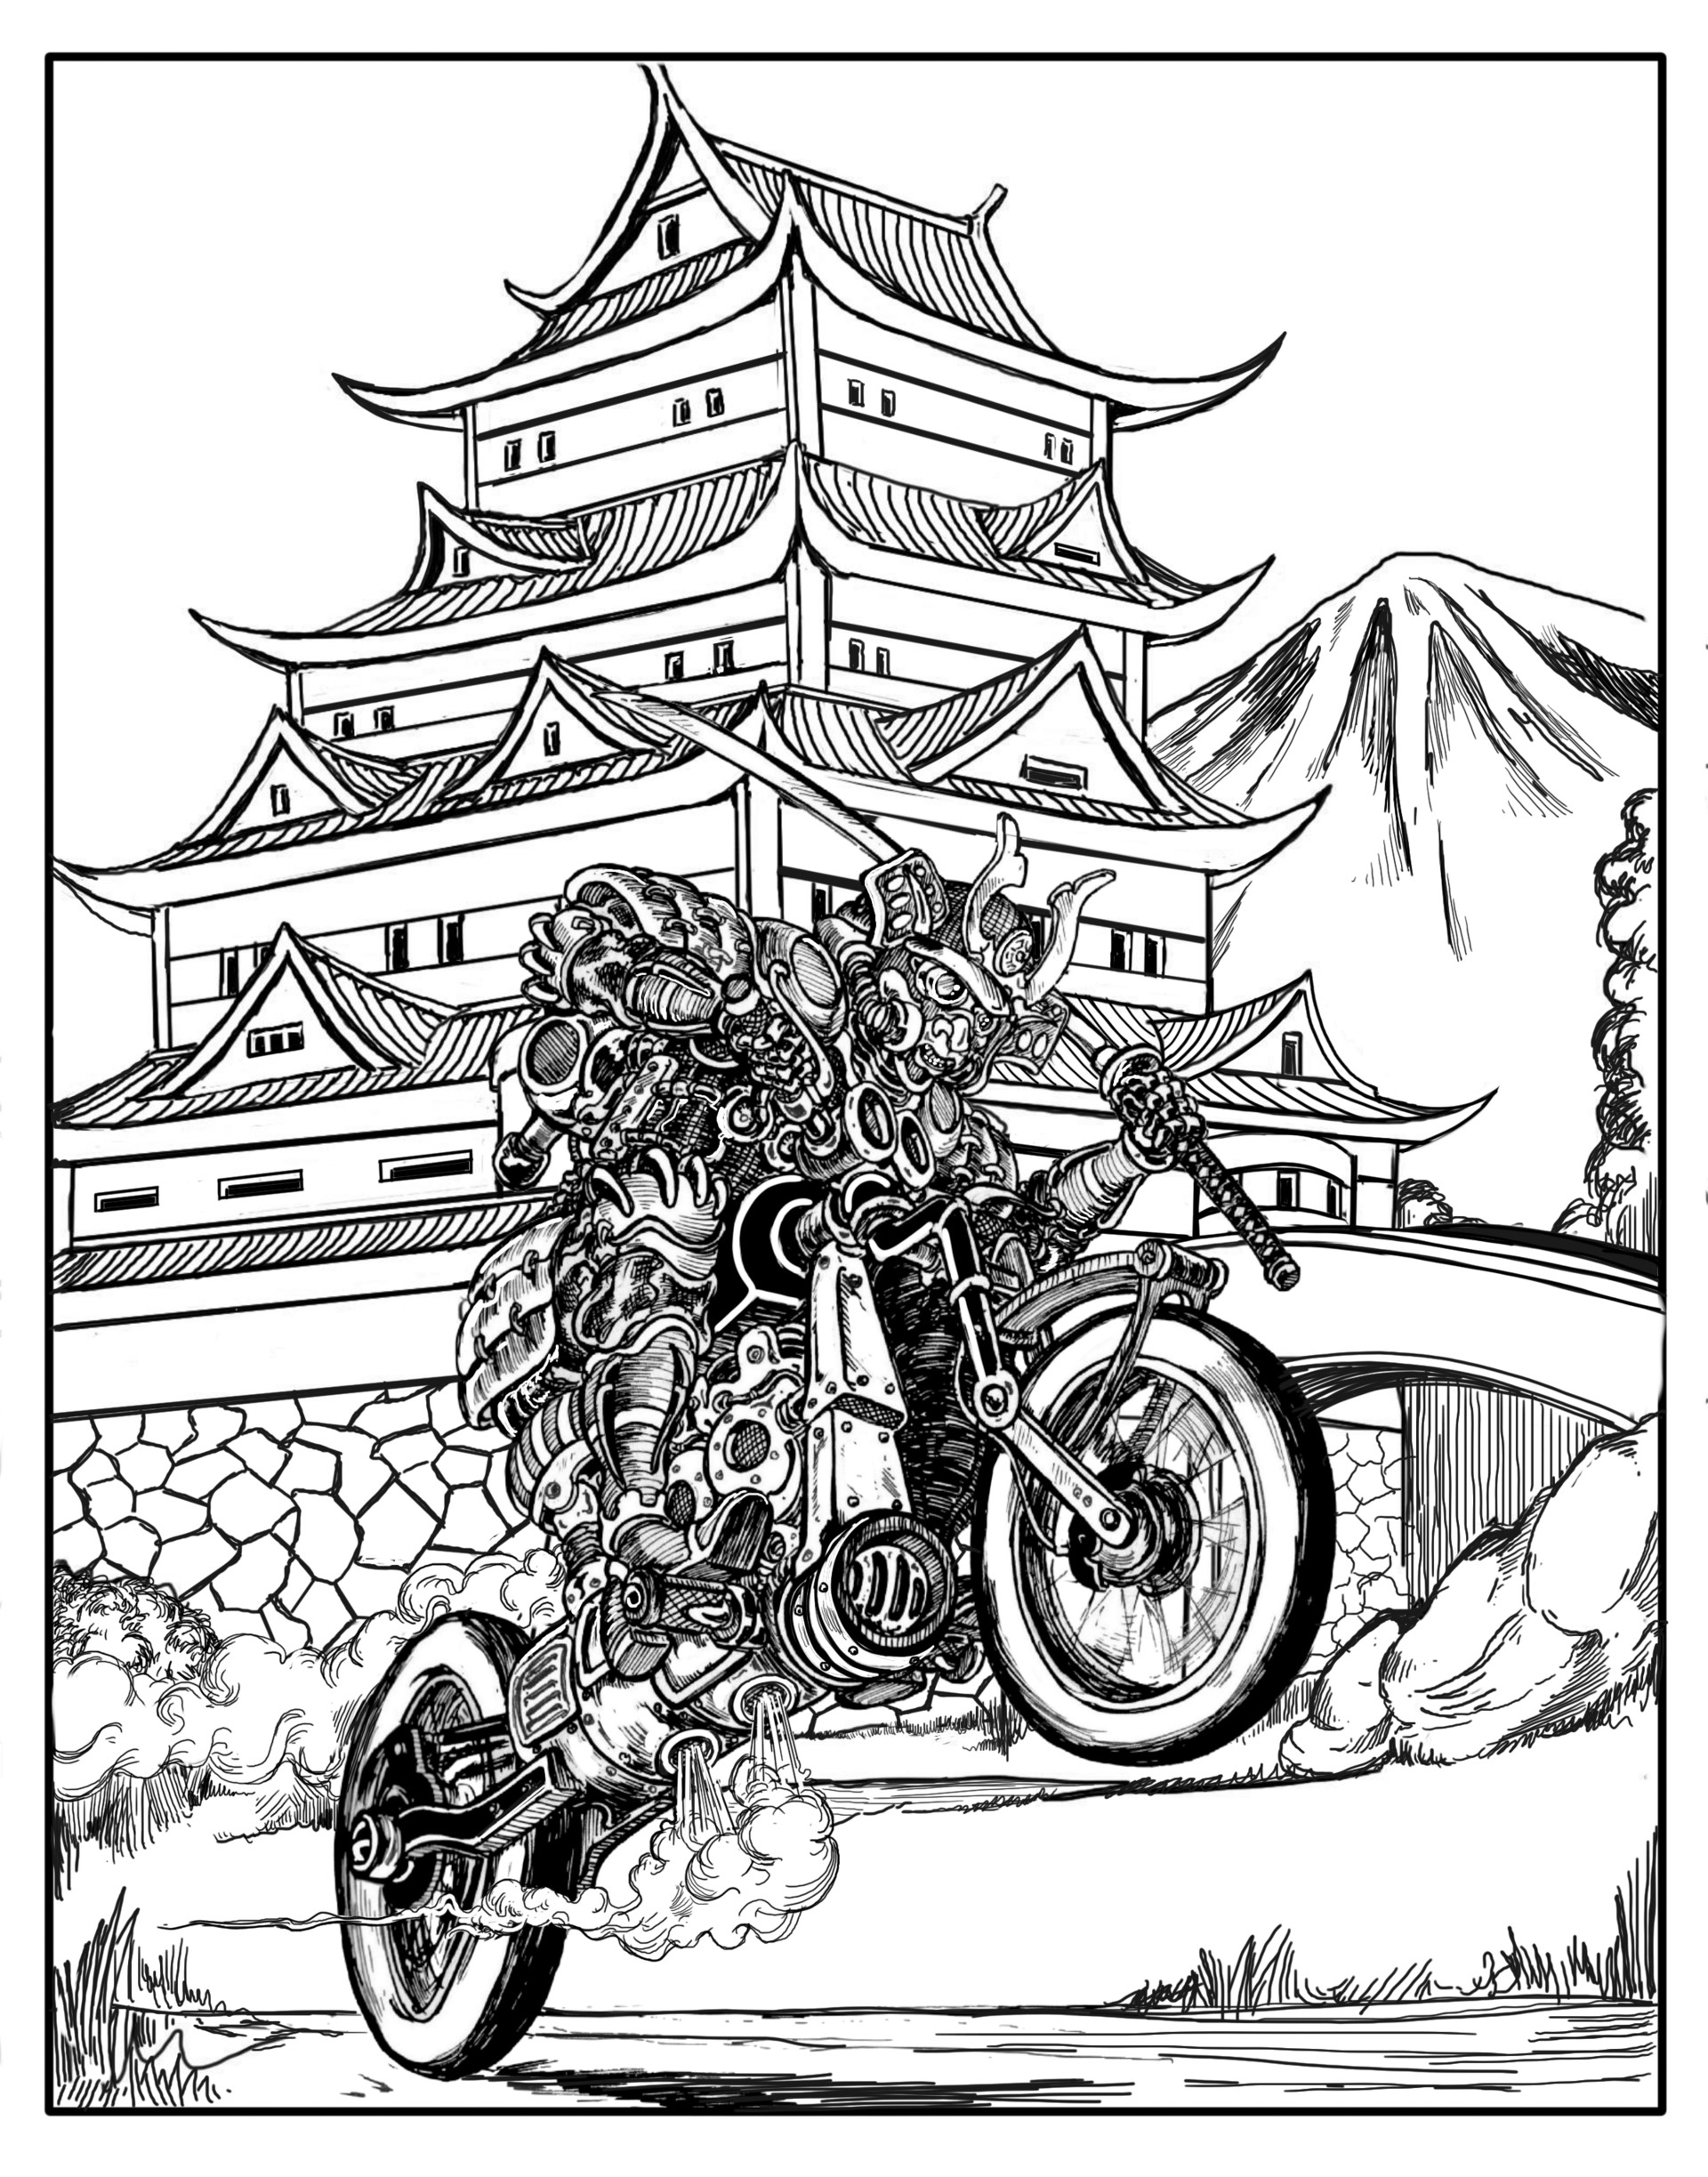 Background added in using Sketchbook Pro